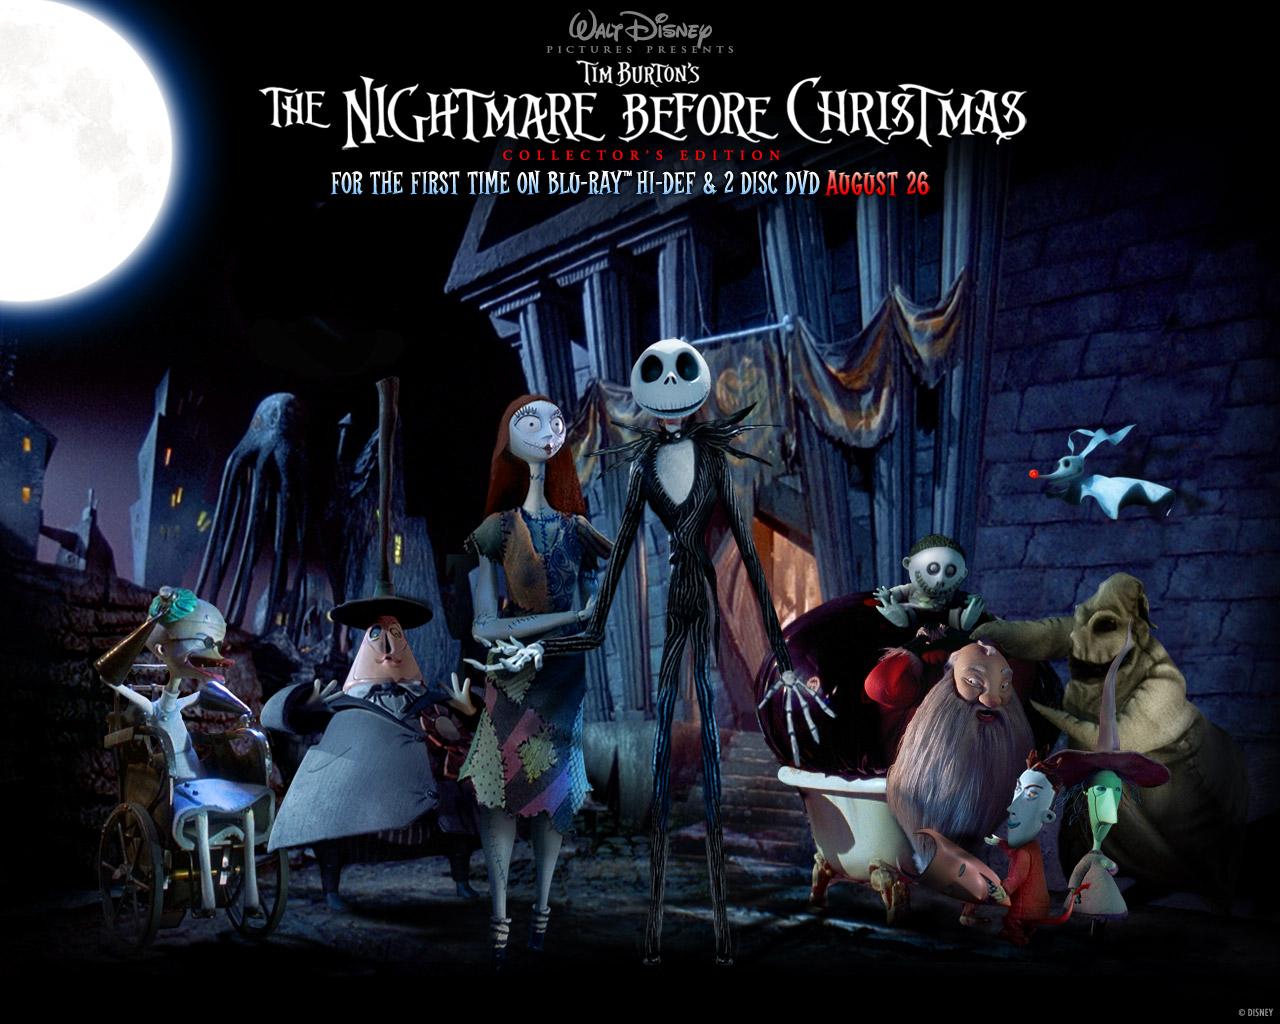 HalloweenTown Posing Nightmare Before Christmas Wallpaper ...